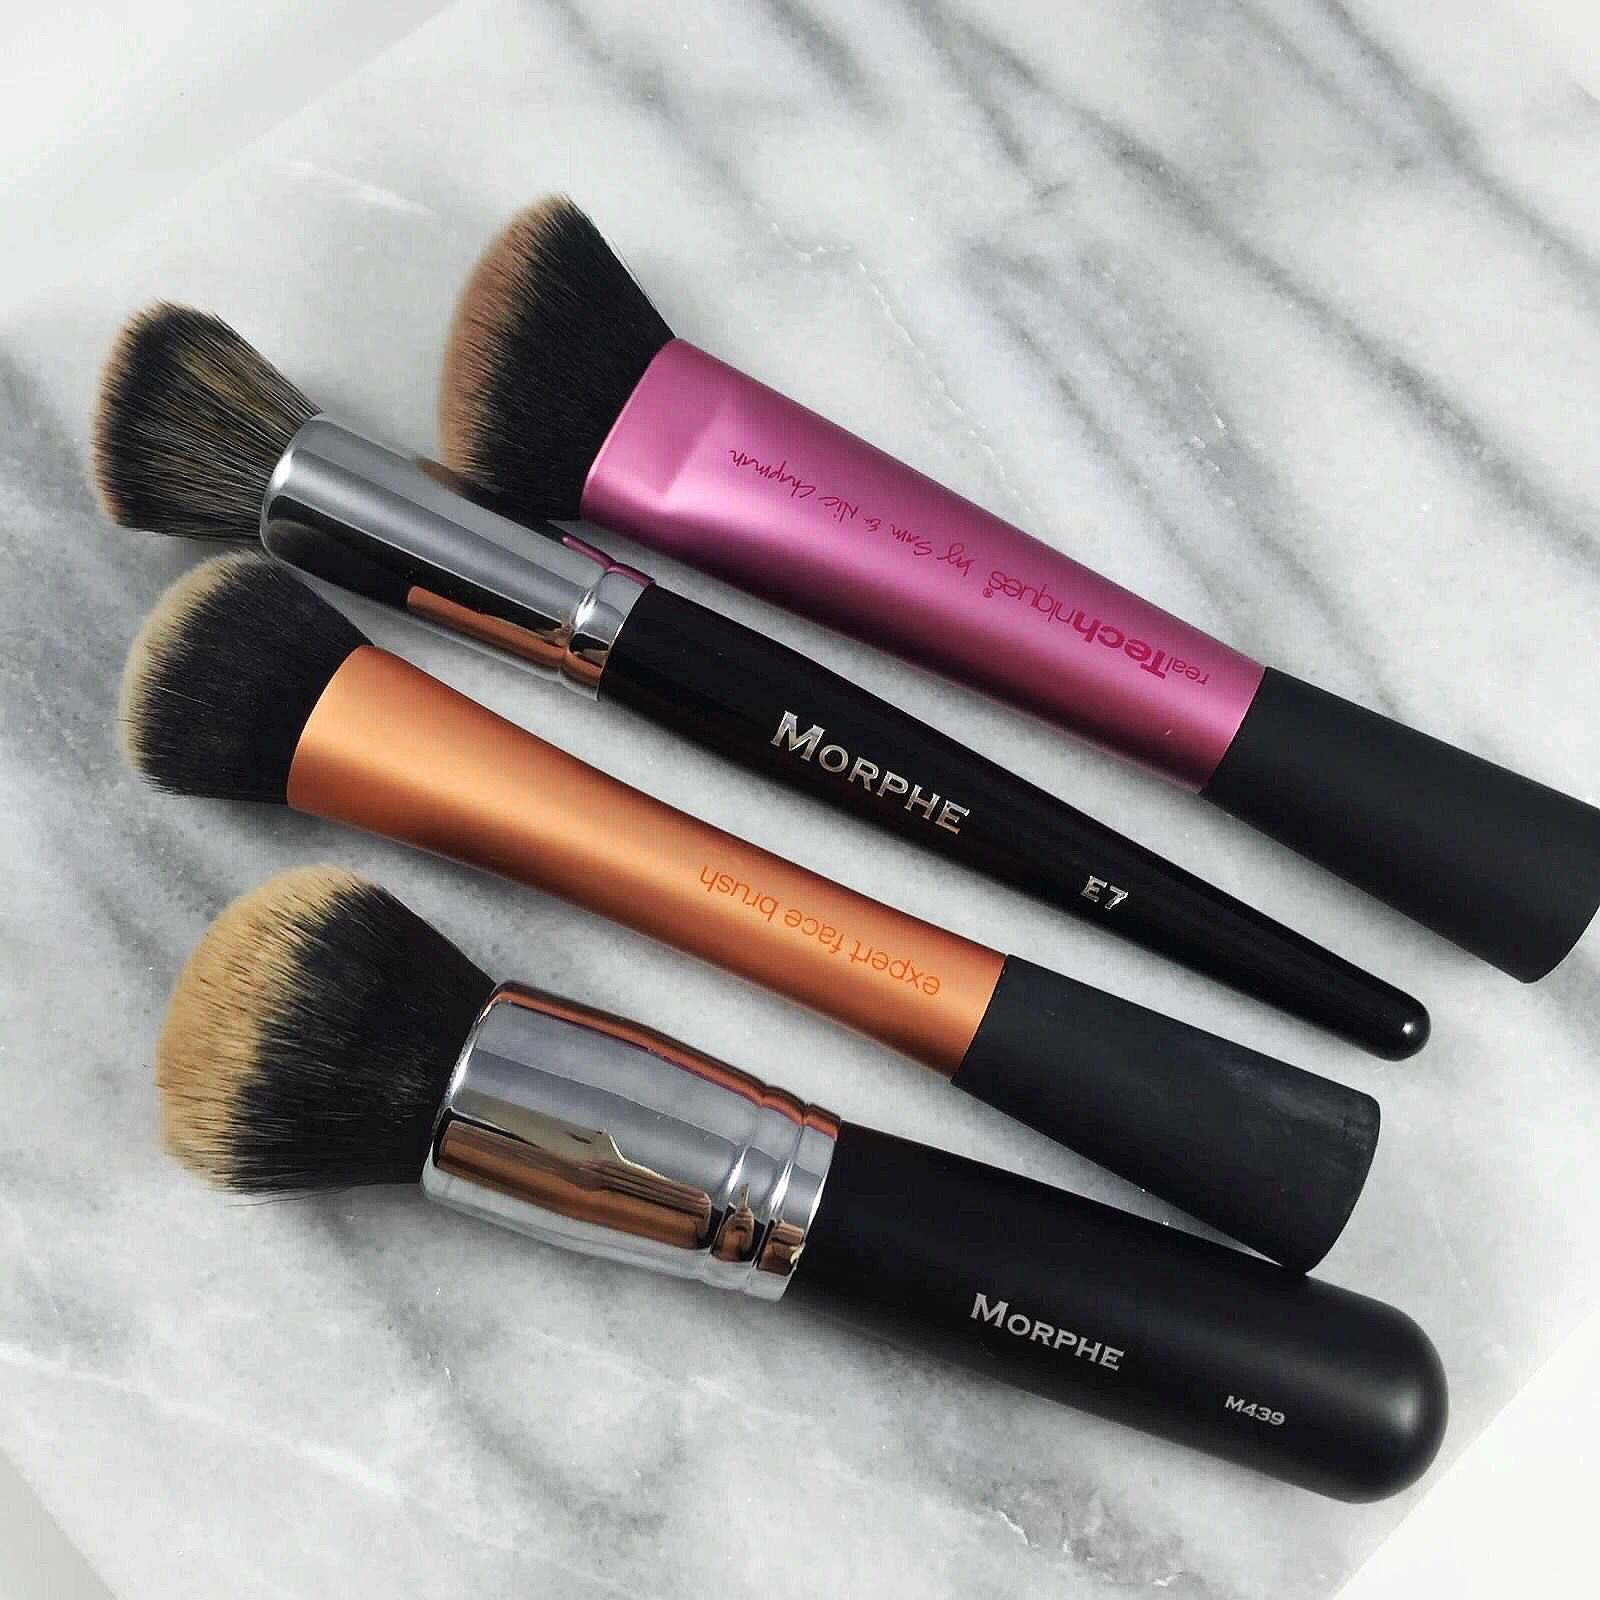 Makeup Brushes Morphe M 439 • Real Techniques Face Brush